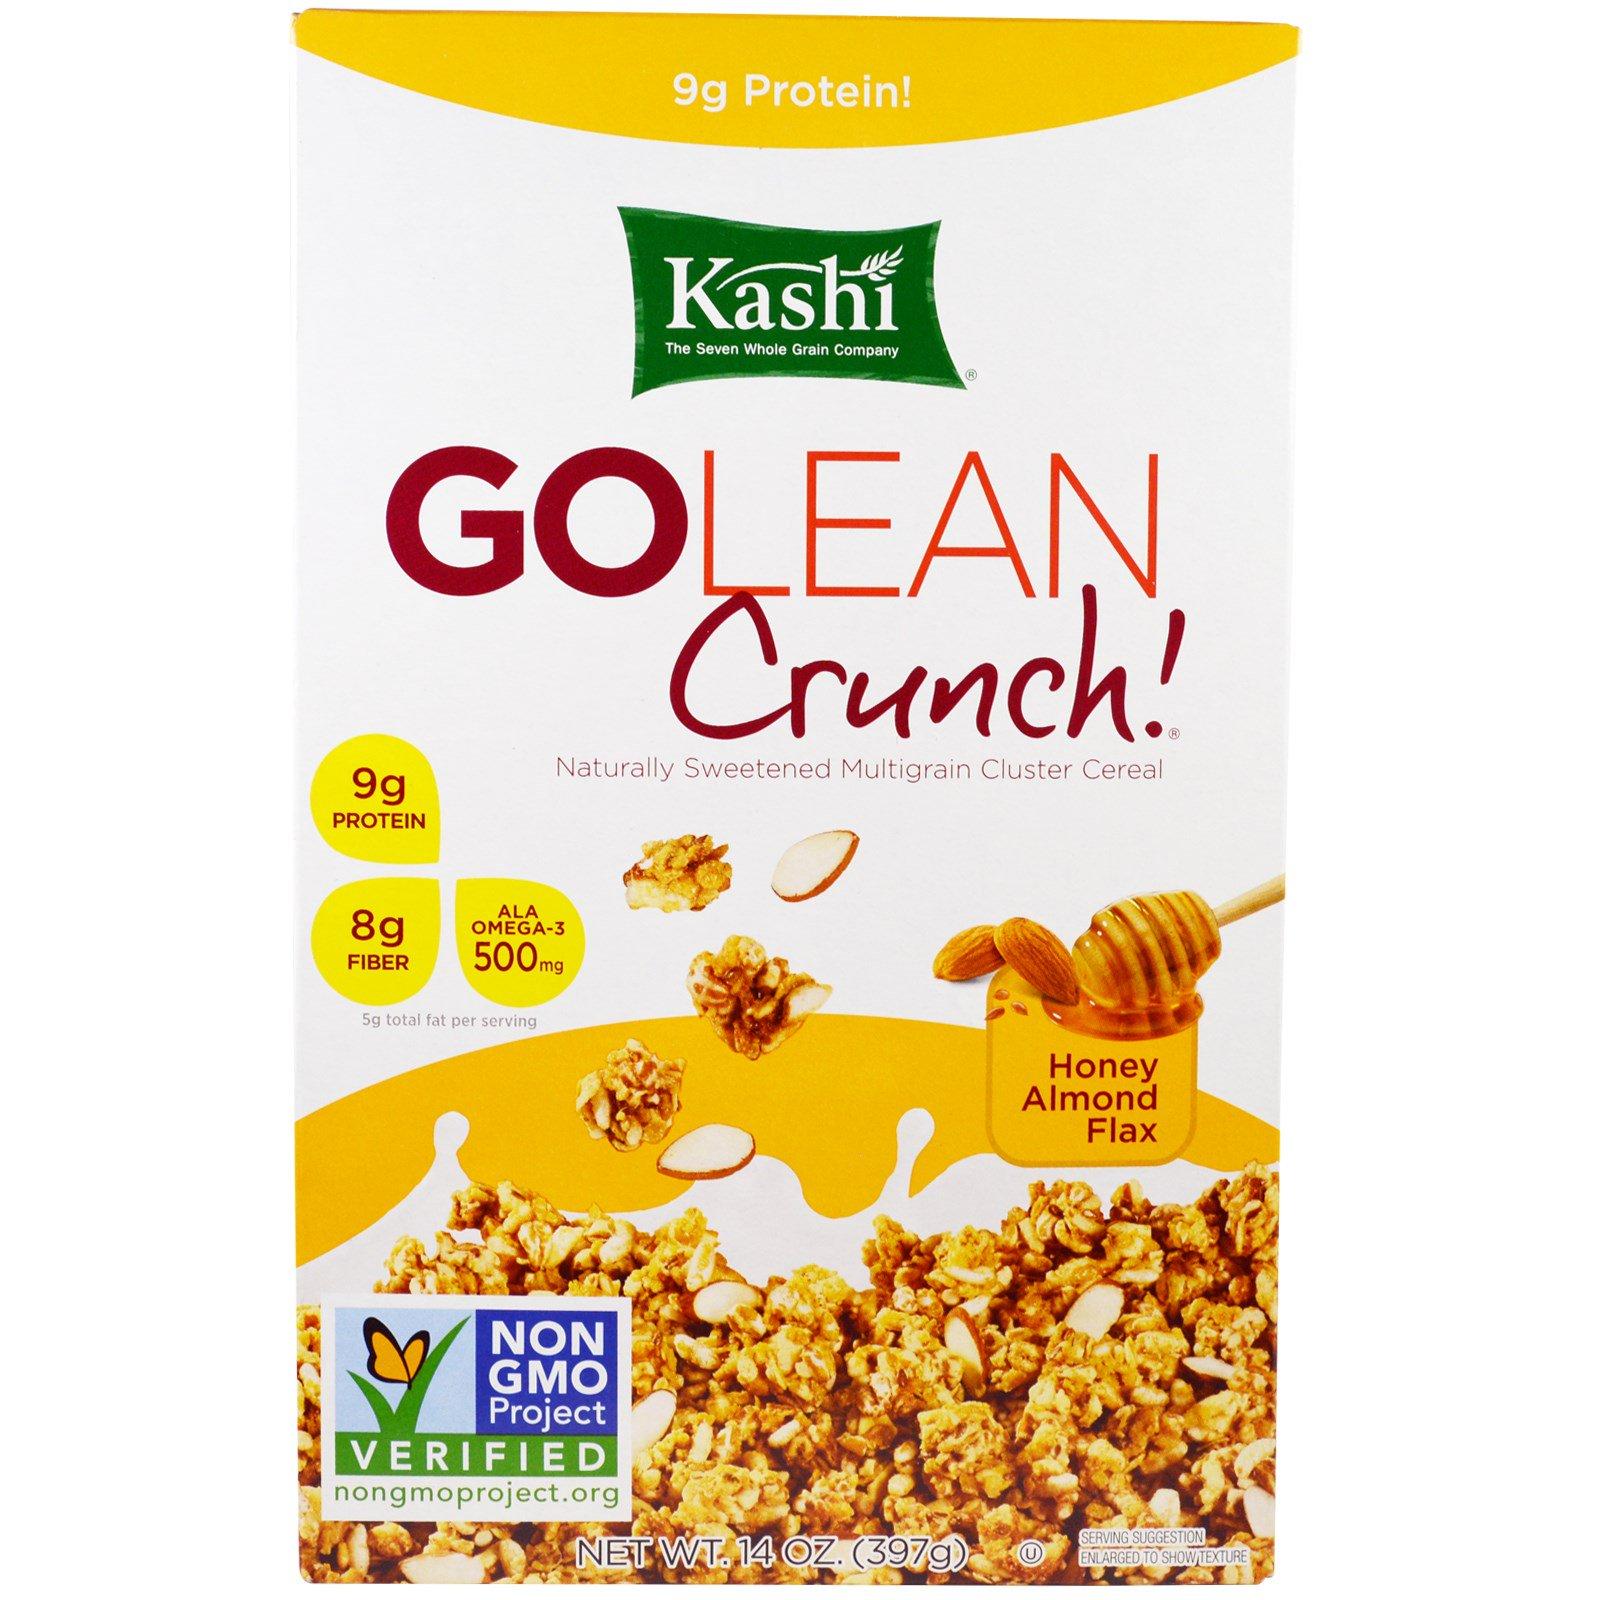 Kashi, GoLean Crunch! мед, миндаль, лен, 14 унций (397 г)